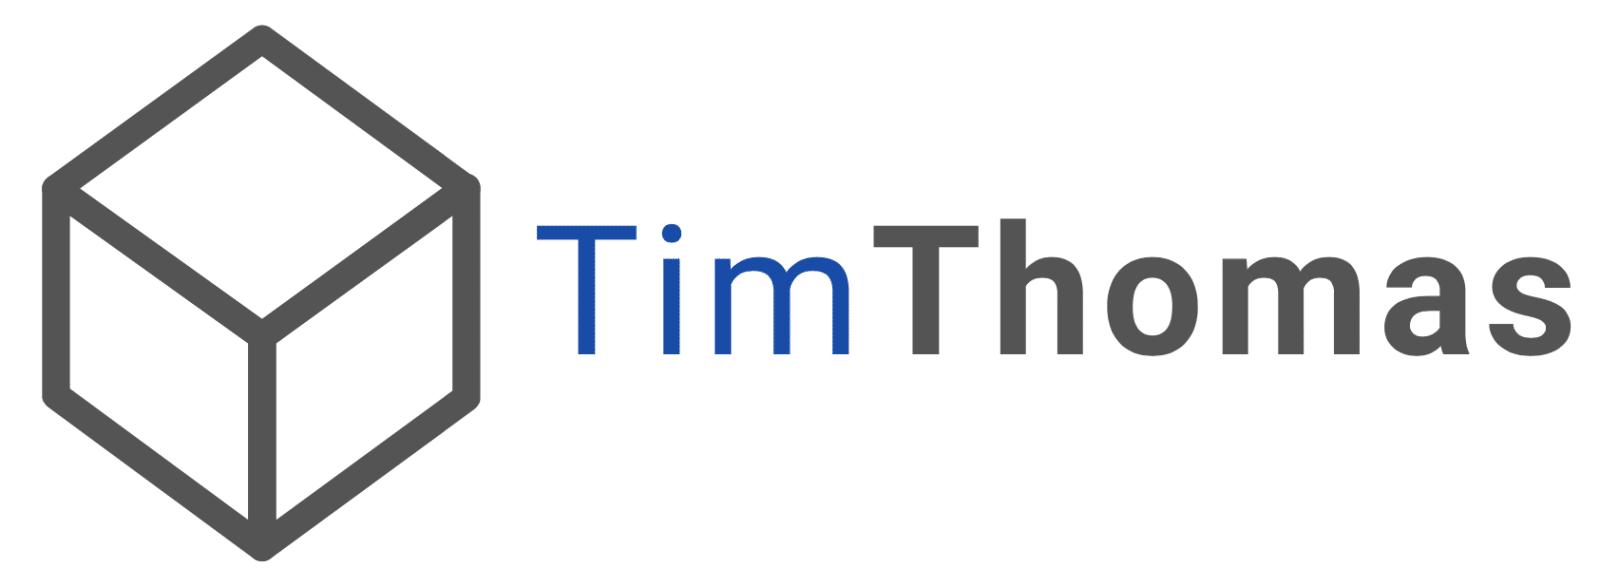 Tim Thomas Co